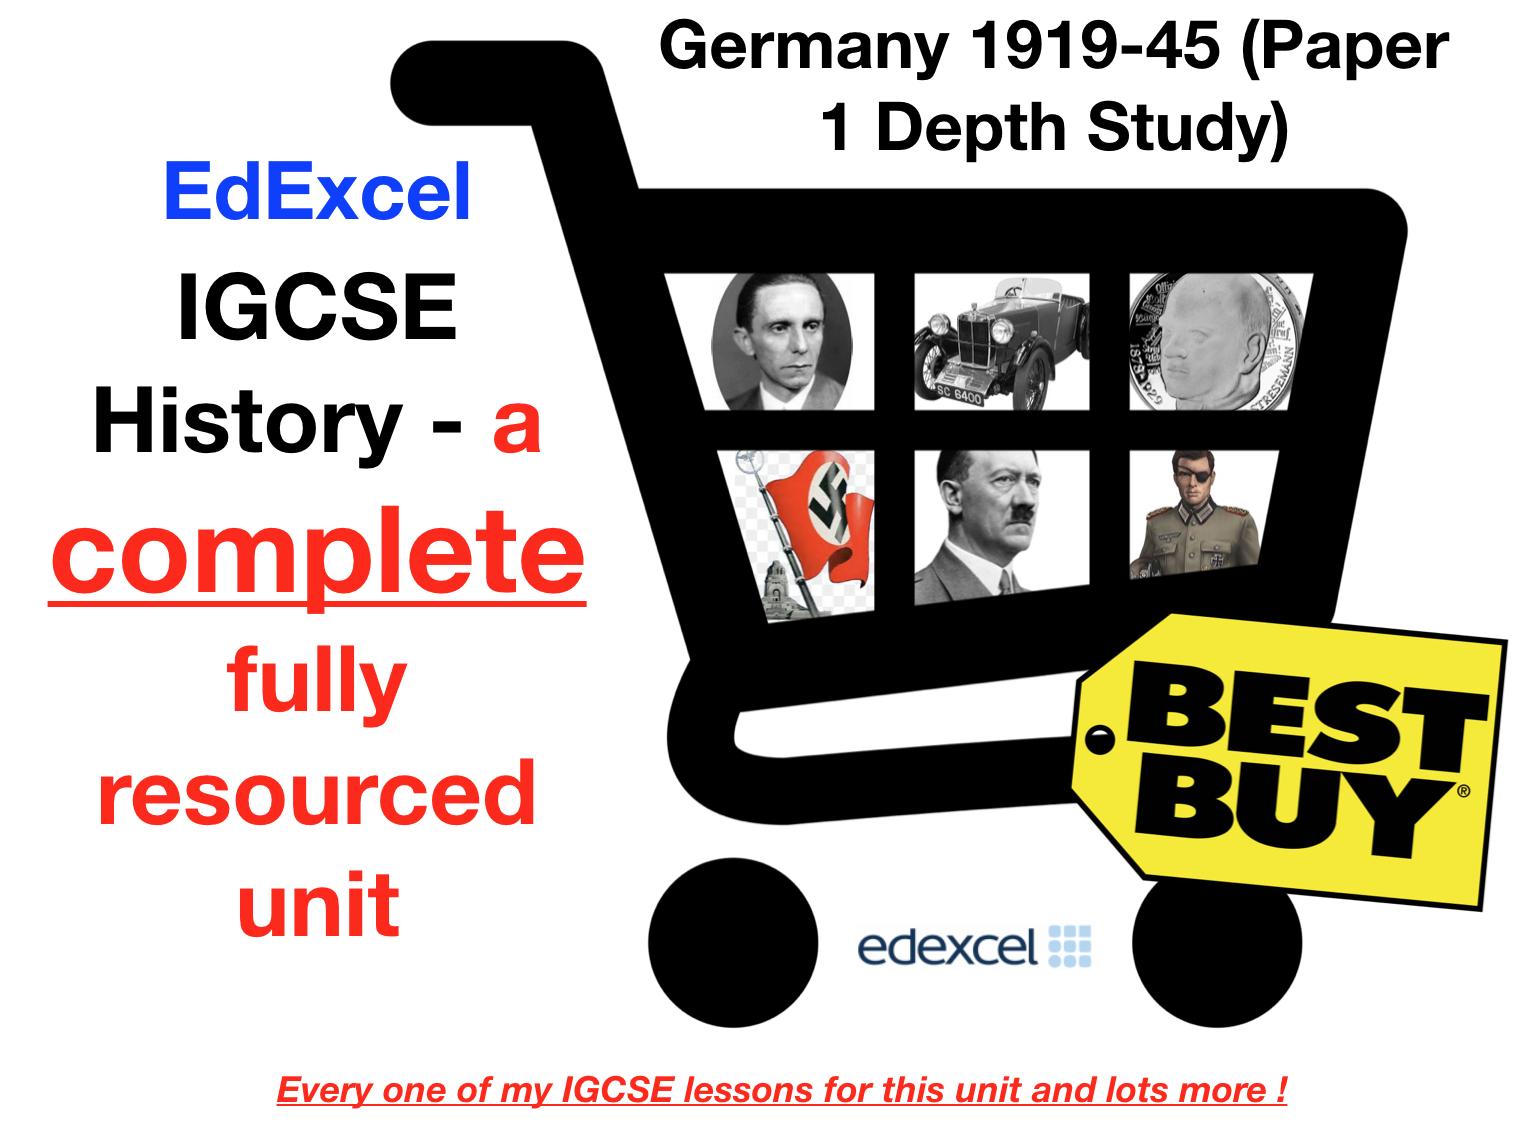 EdExcel IGCSE History - Germany 1918-45 Full Unit Paper 1 Depth Study Bundle (with Revision Menu)